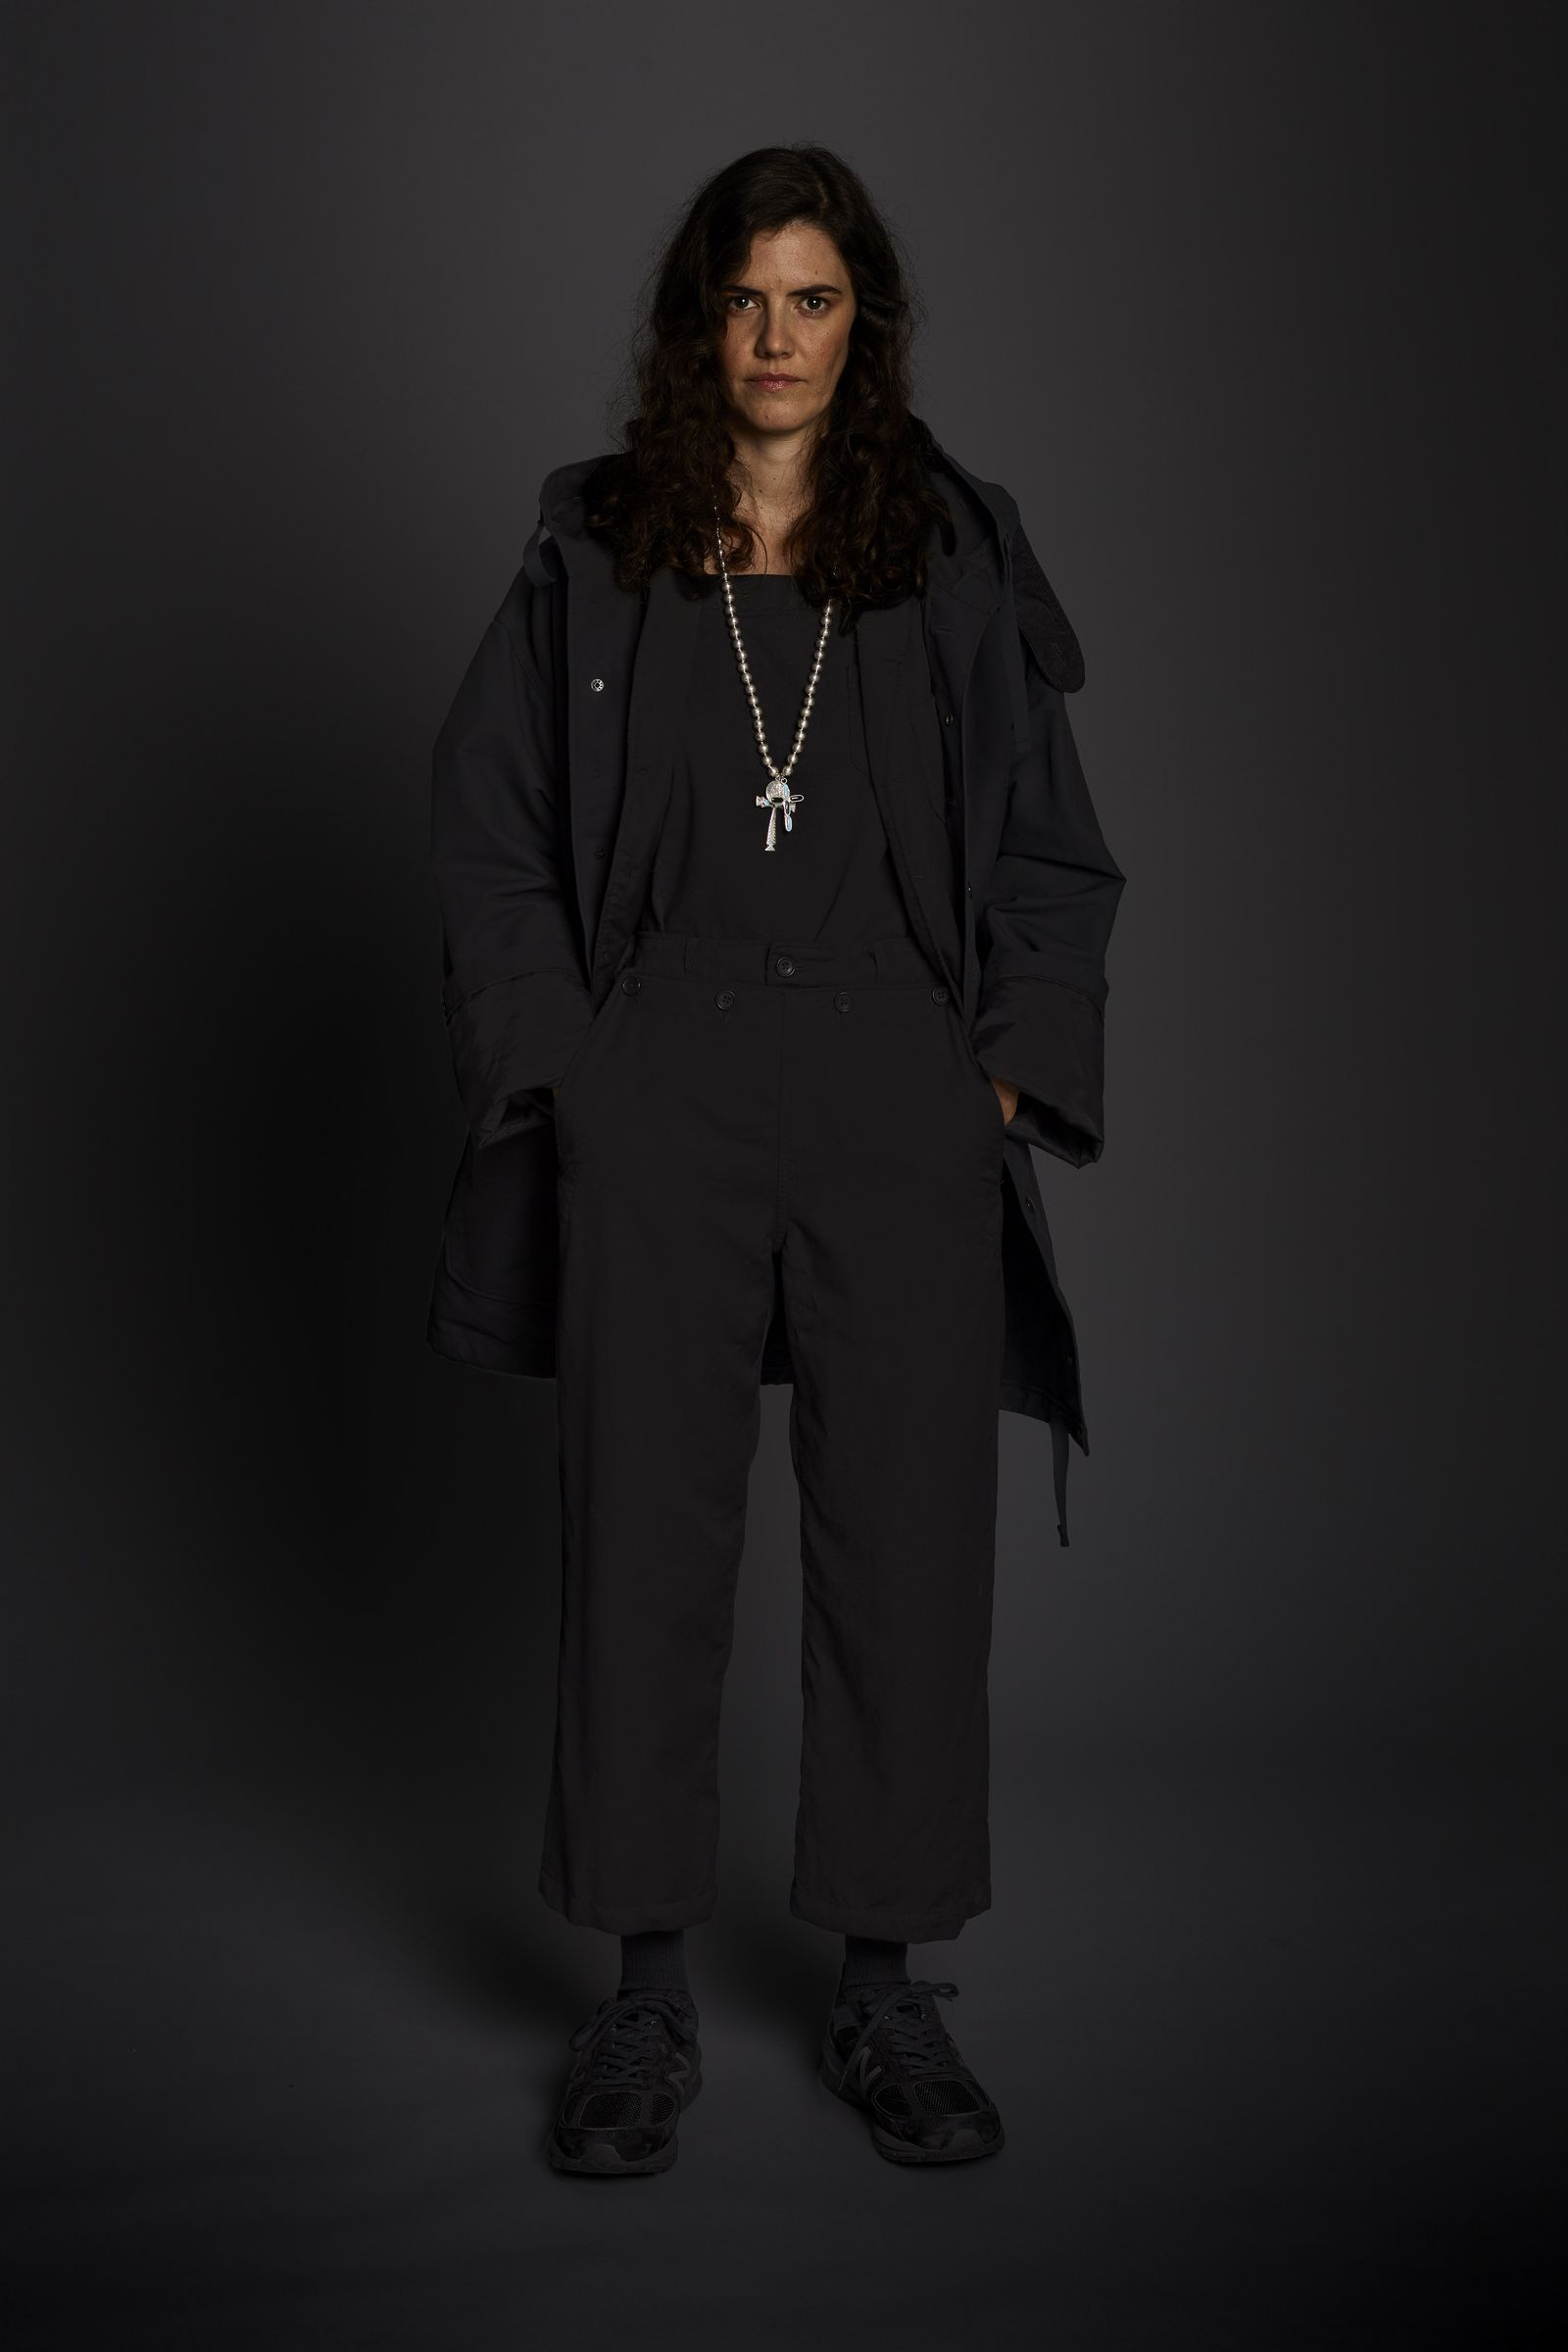 engineered-garments-fall-winter-2020-38